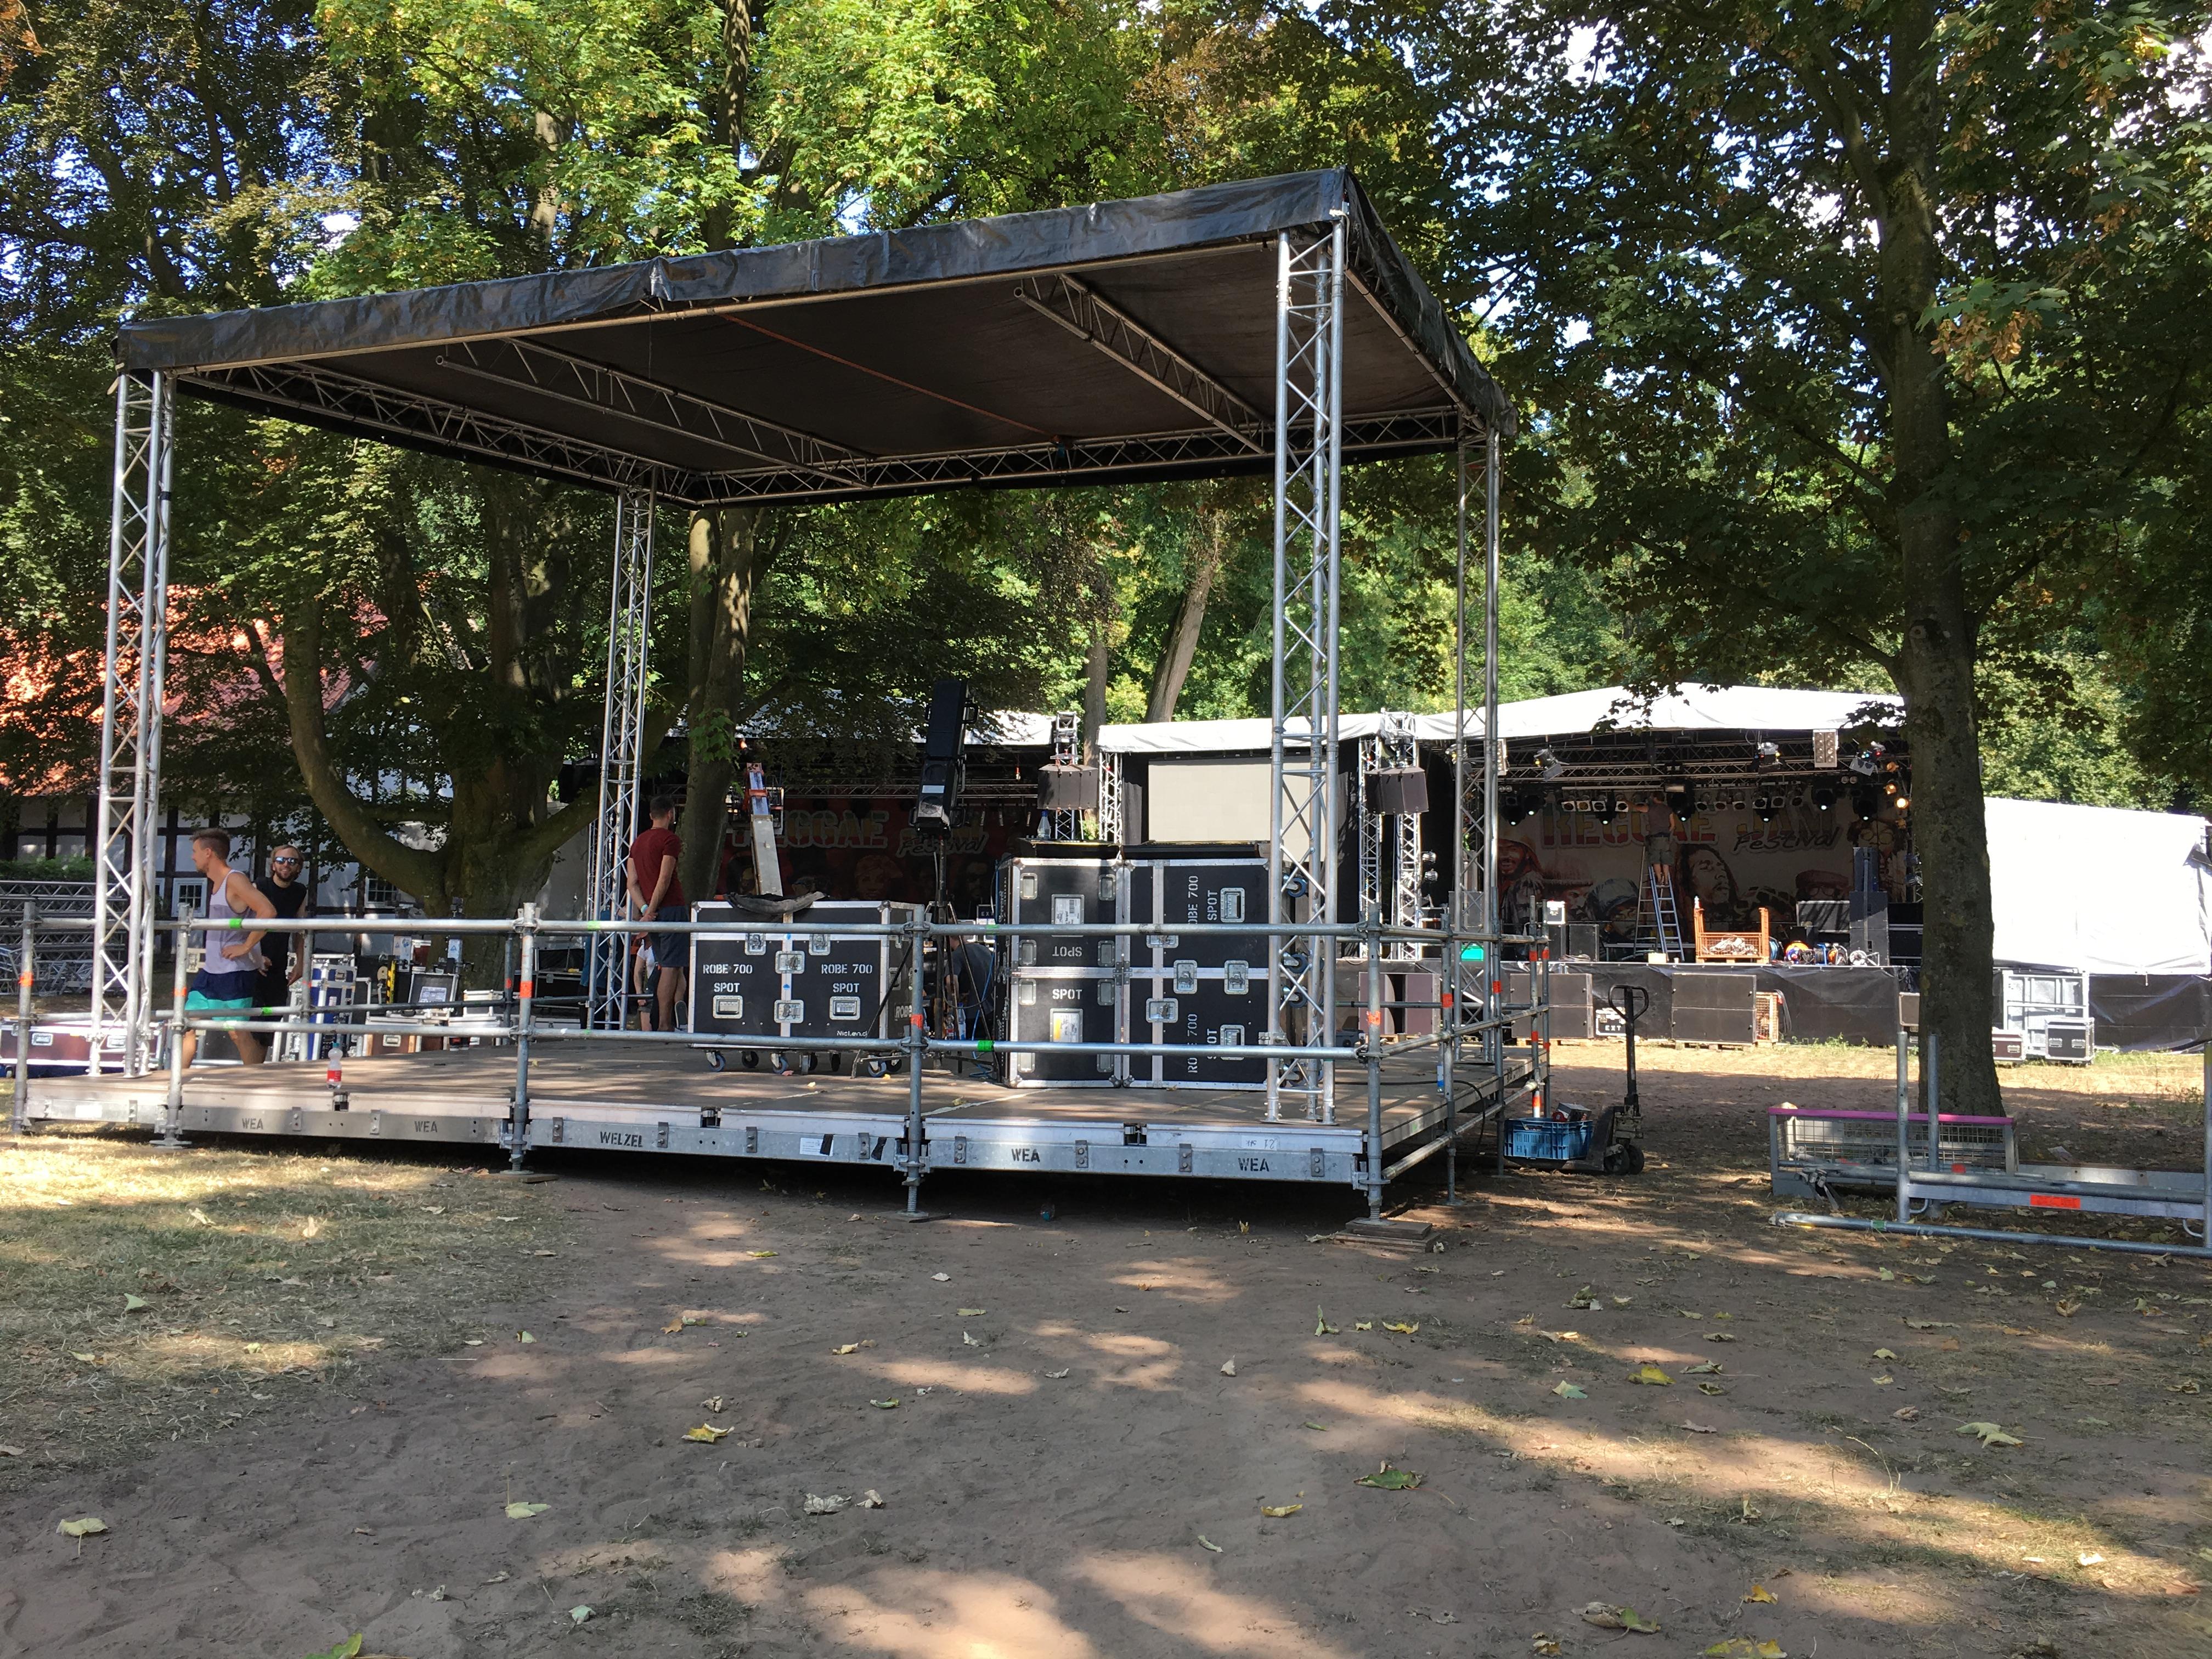 Reggae Jam 2018: Bühnenaufbau im Klosterpark (Bild: Wolfgang Alexander Meyer)